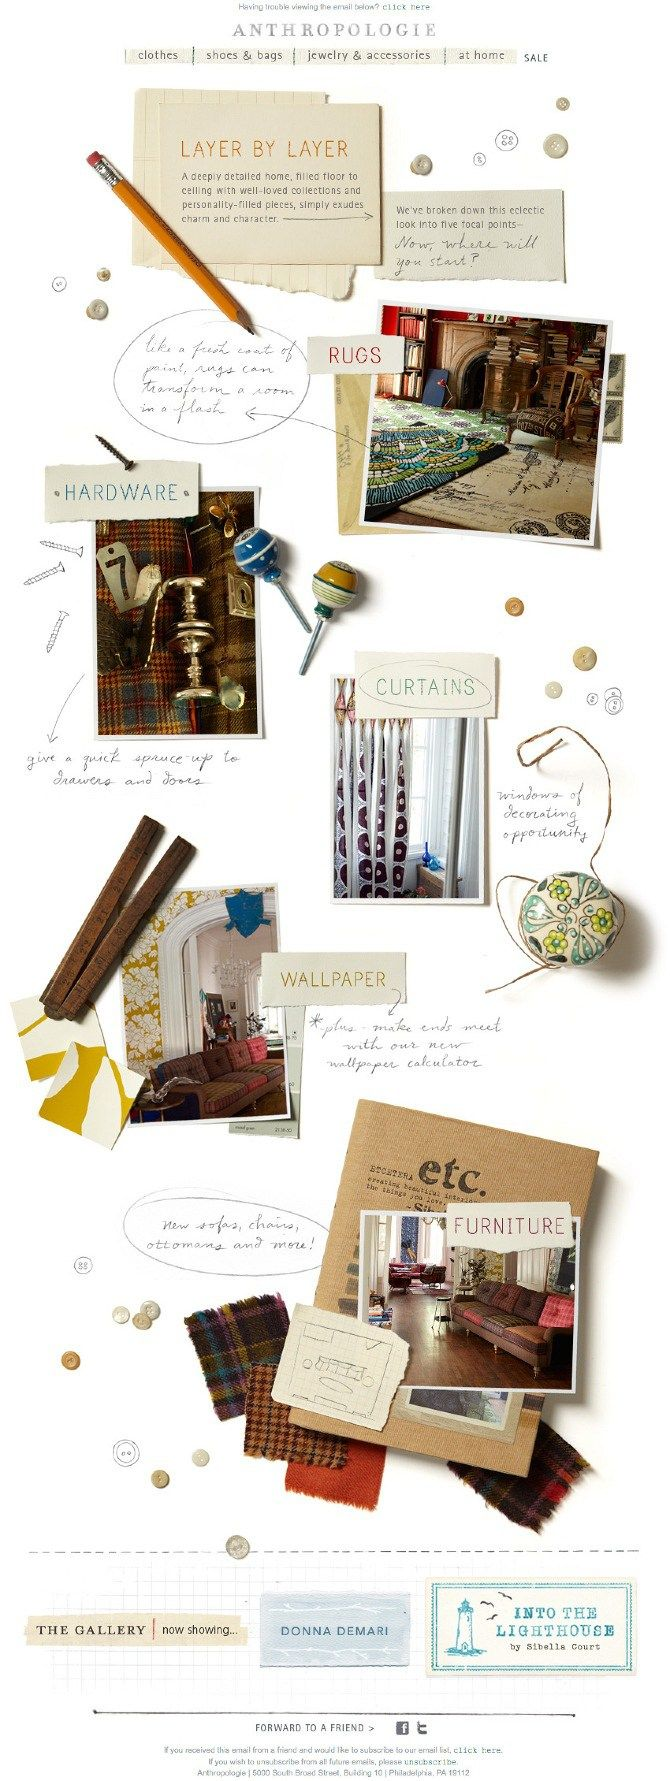 32 best web design images on pinterest design web design websites creative layout to model for email newsletter jenna mcbride graphic interactive design fandeluxe Gallery